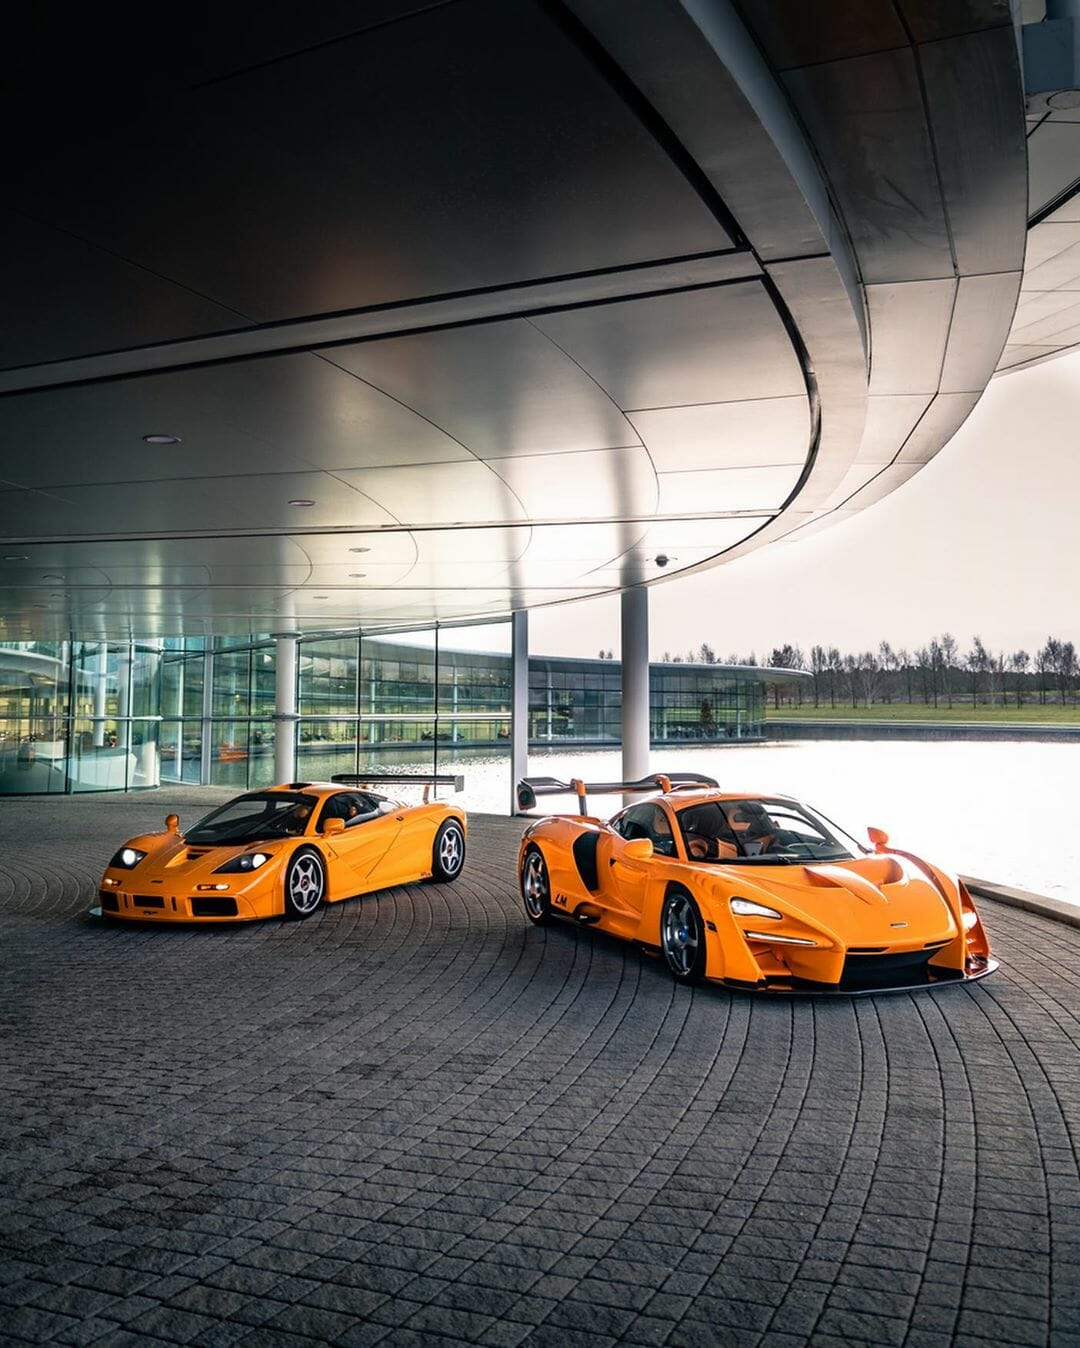 McLaren F1 LM & McLaren Senna - Image 13